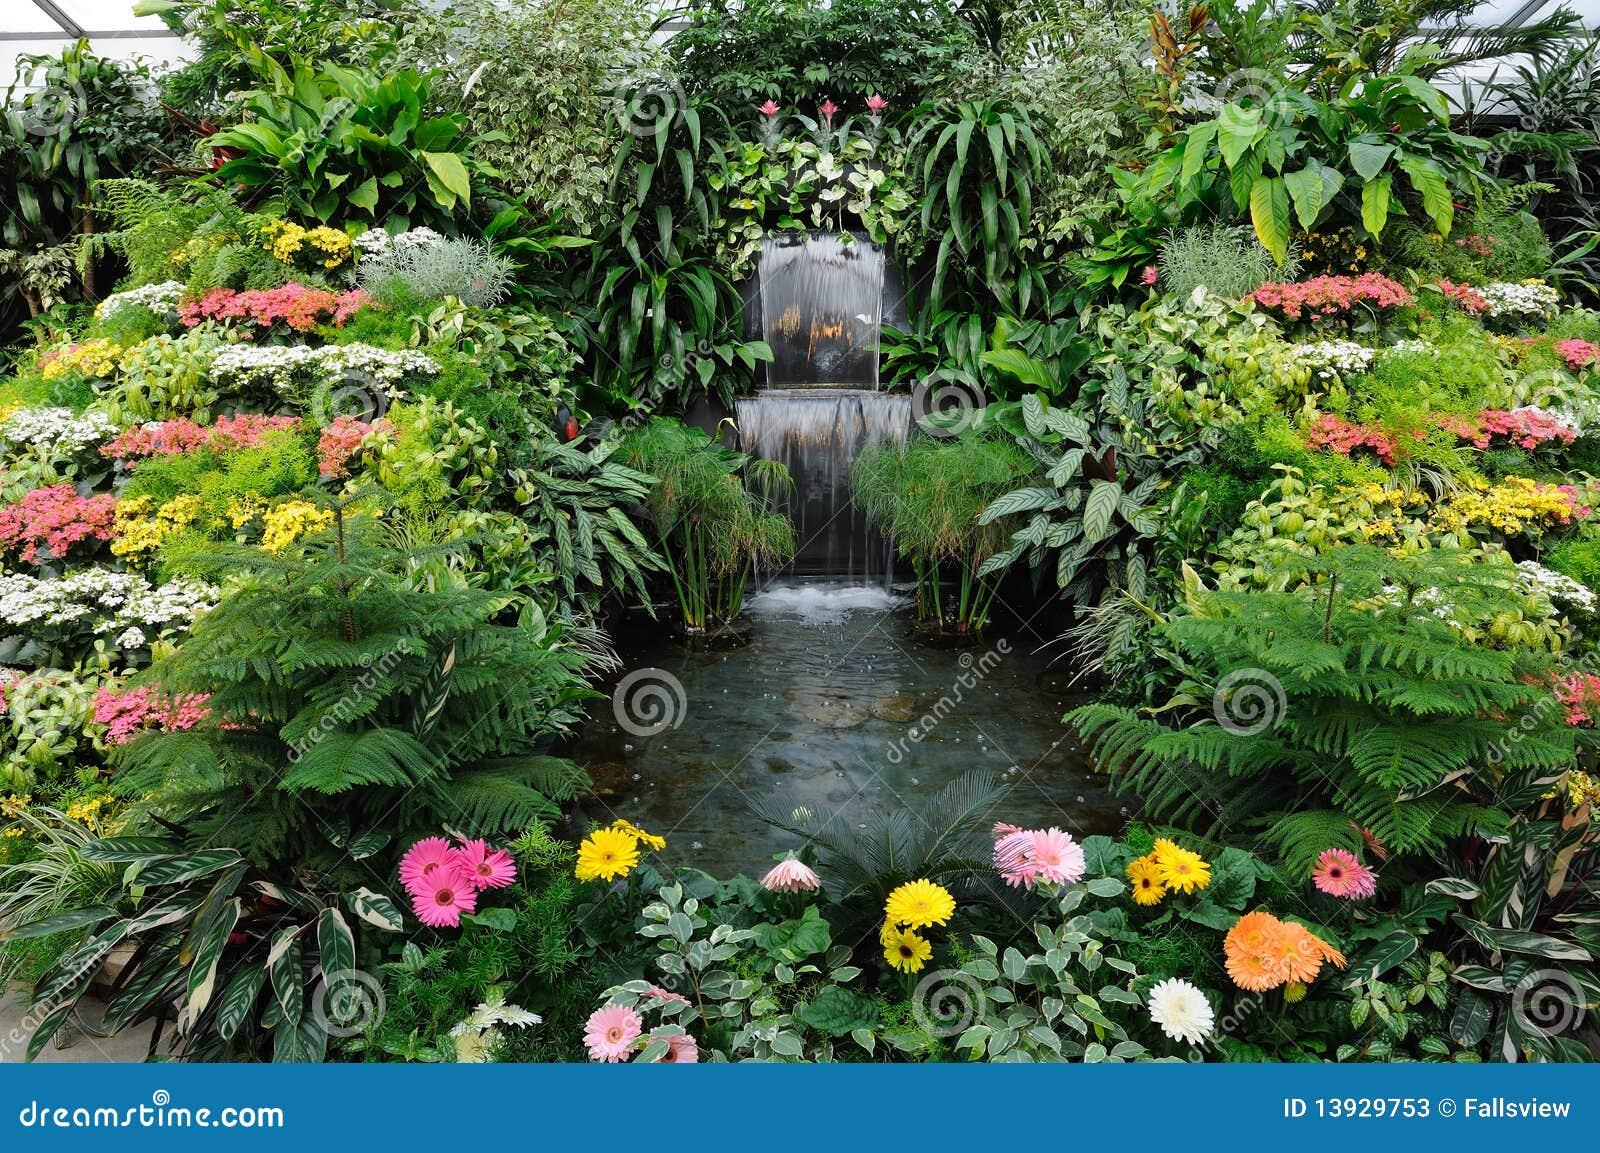 fotos de jardim interno : fotos de jardim interno:Fotos de Stock: Jardim interno